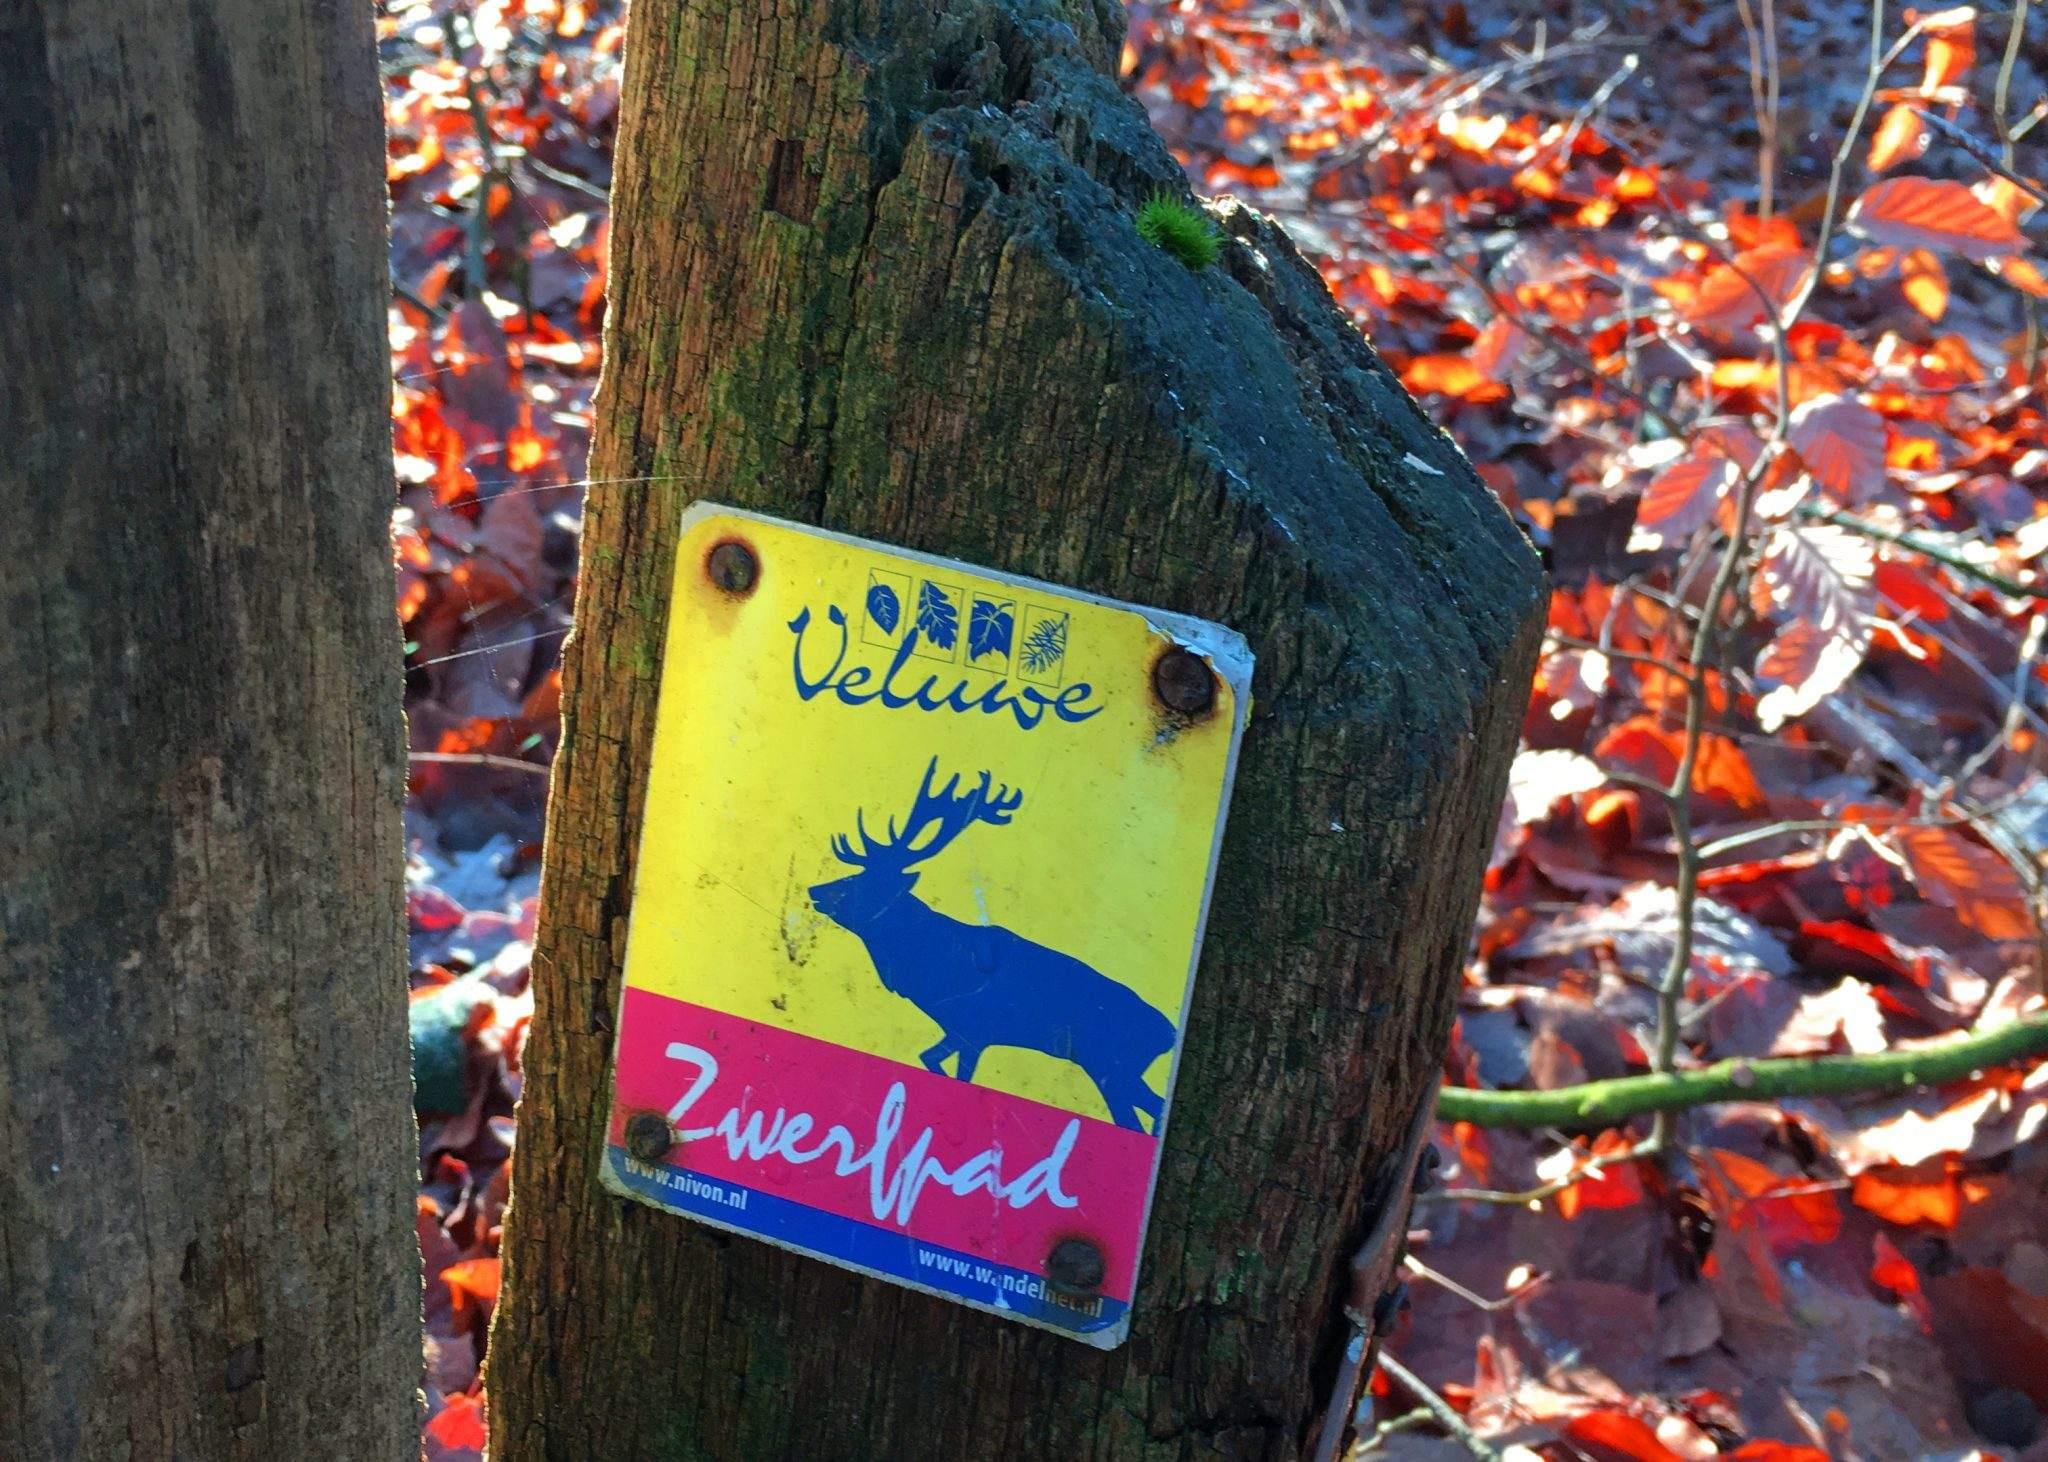 wandelroute oosterbeek wolfheze